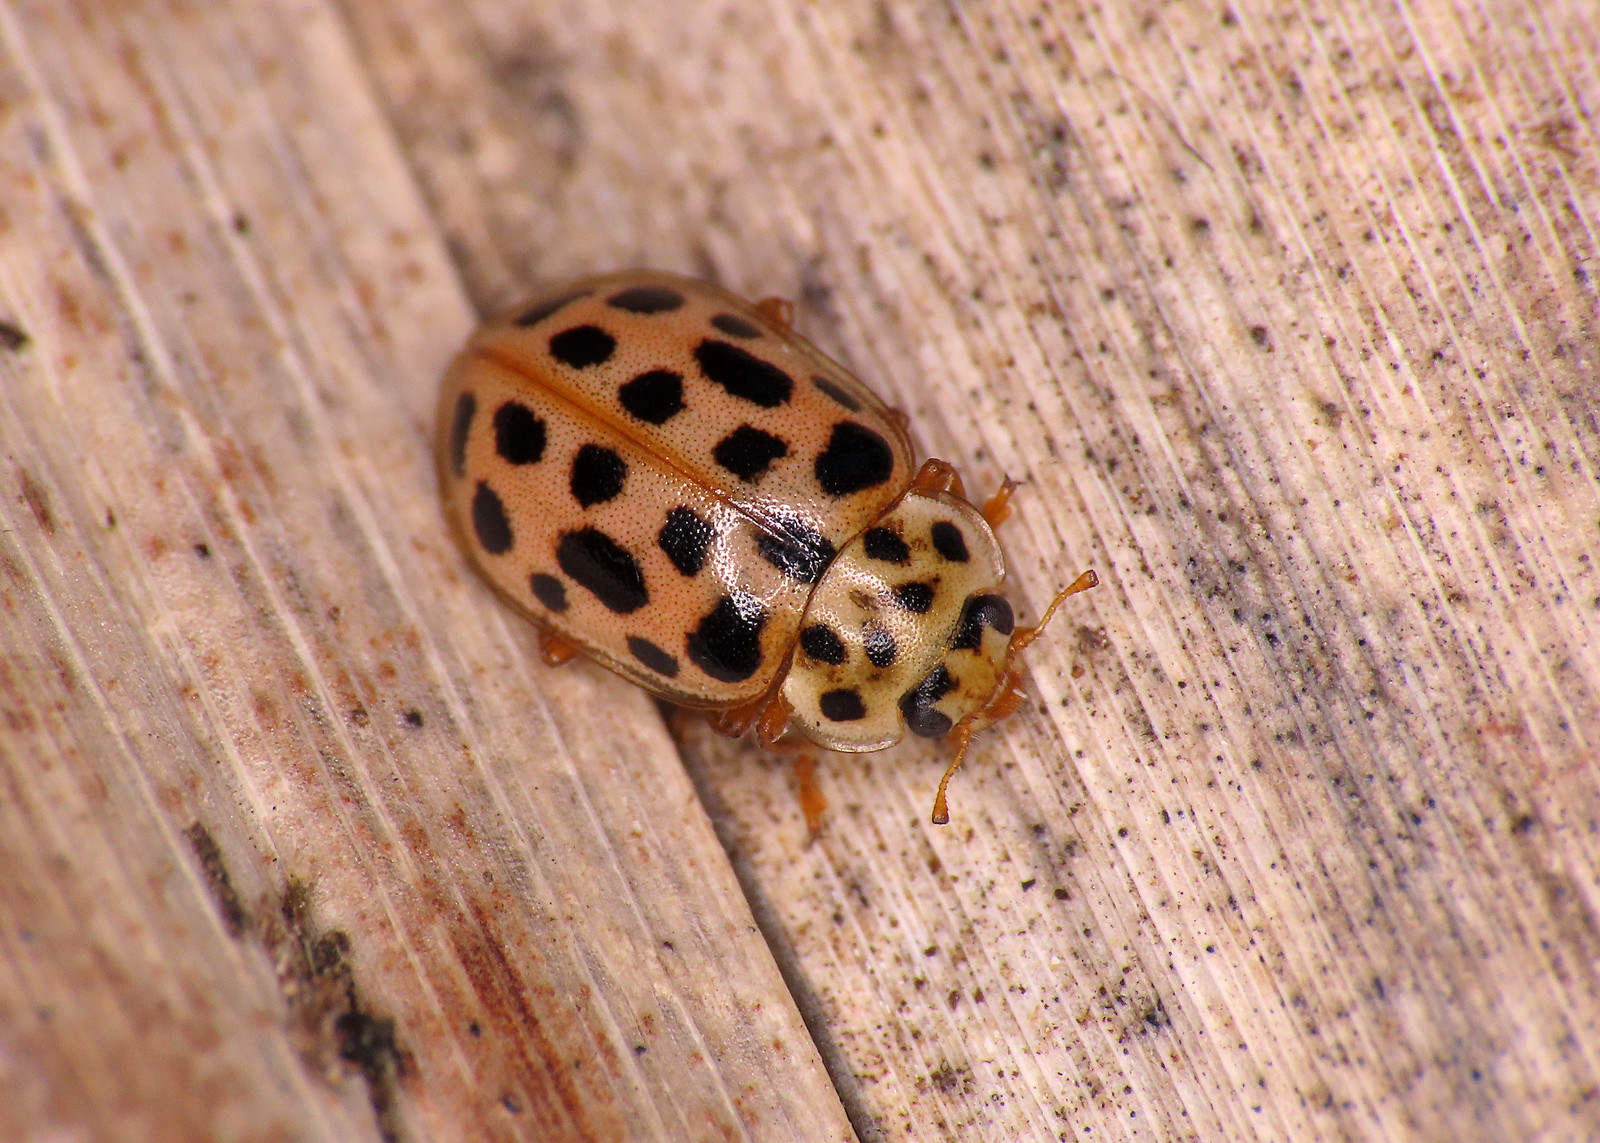 Water Ladybird - Anisosticta novemdecimpunctata